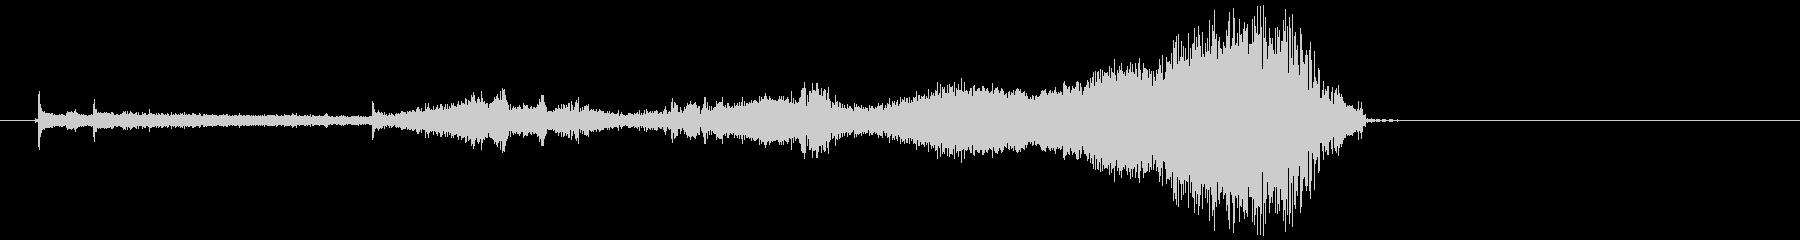 SF タイムスリップ、時空が歪むような音の未再生の波形